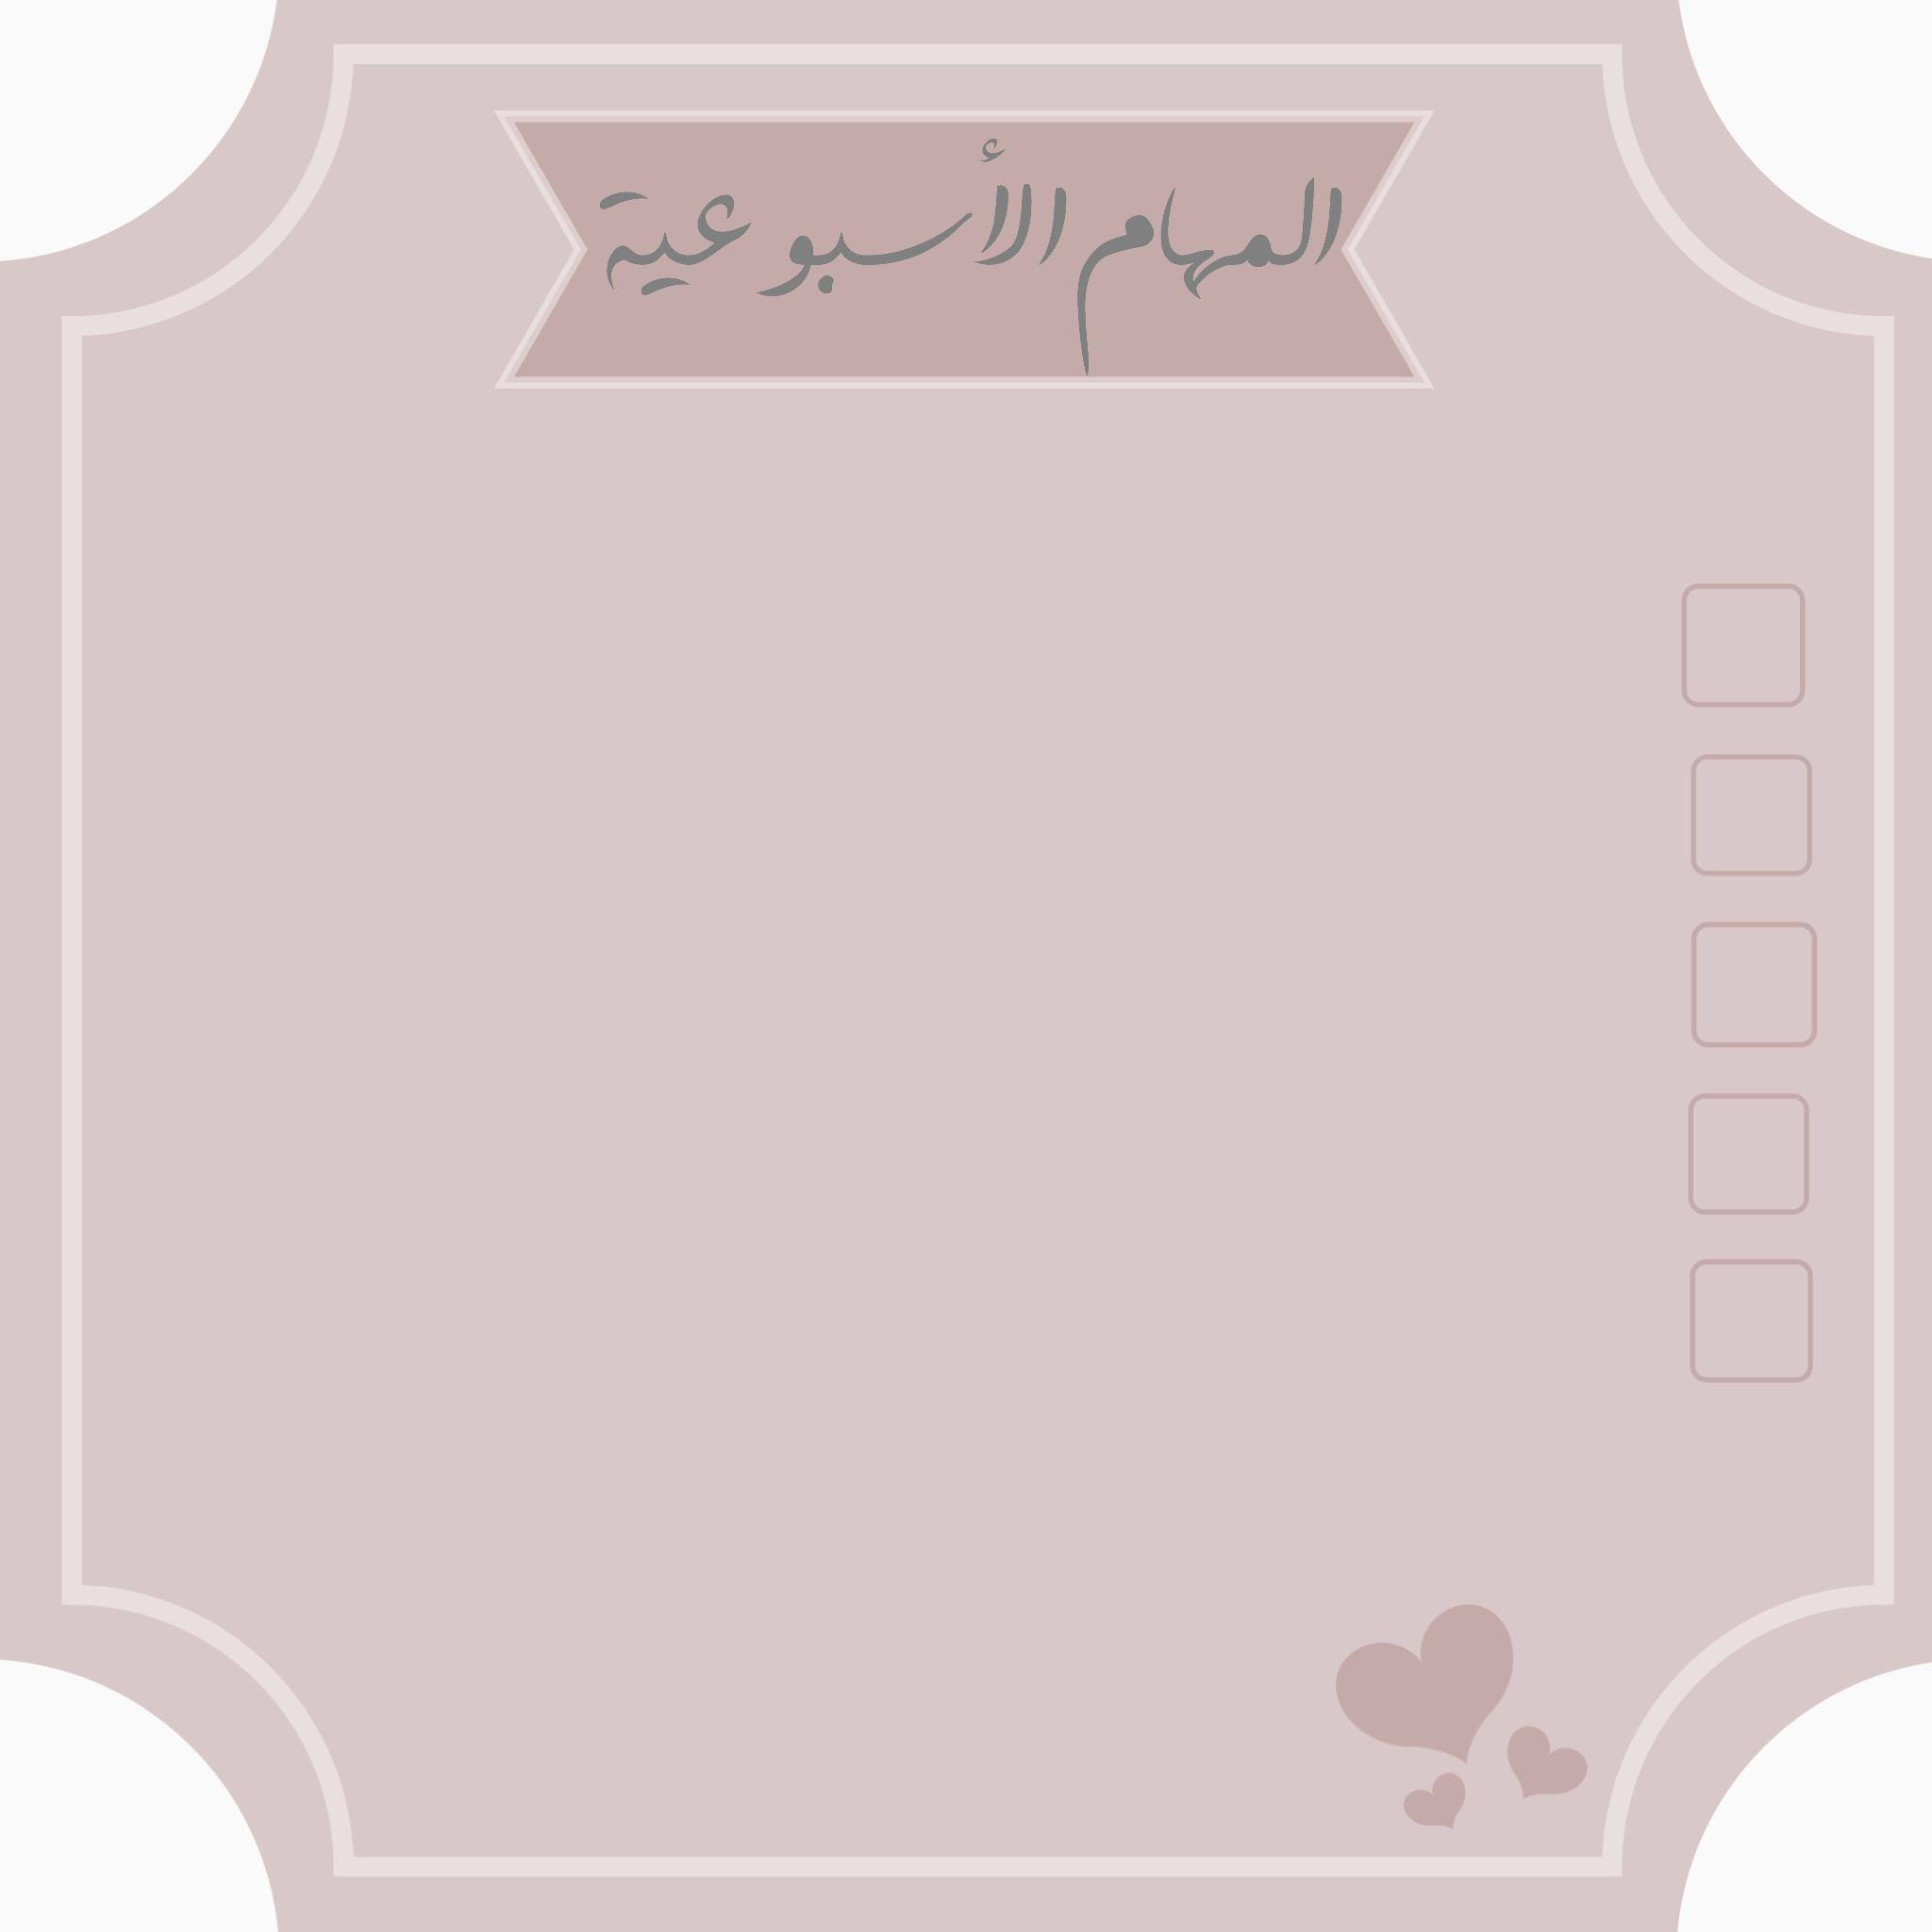 Pin By نوره فهد On بلانر قائمه المهام اليوميه Map Map Screenshot Screenshots